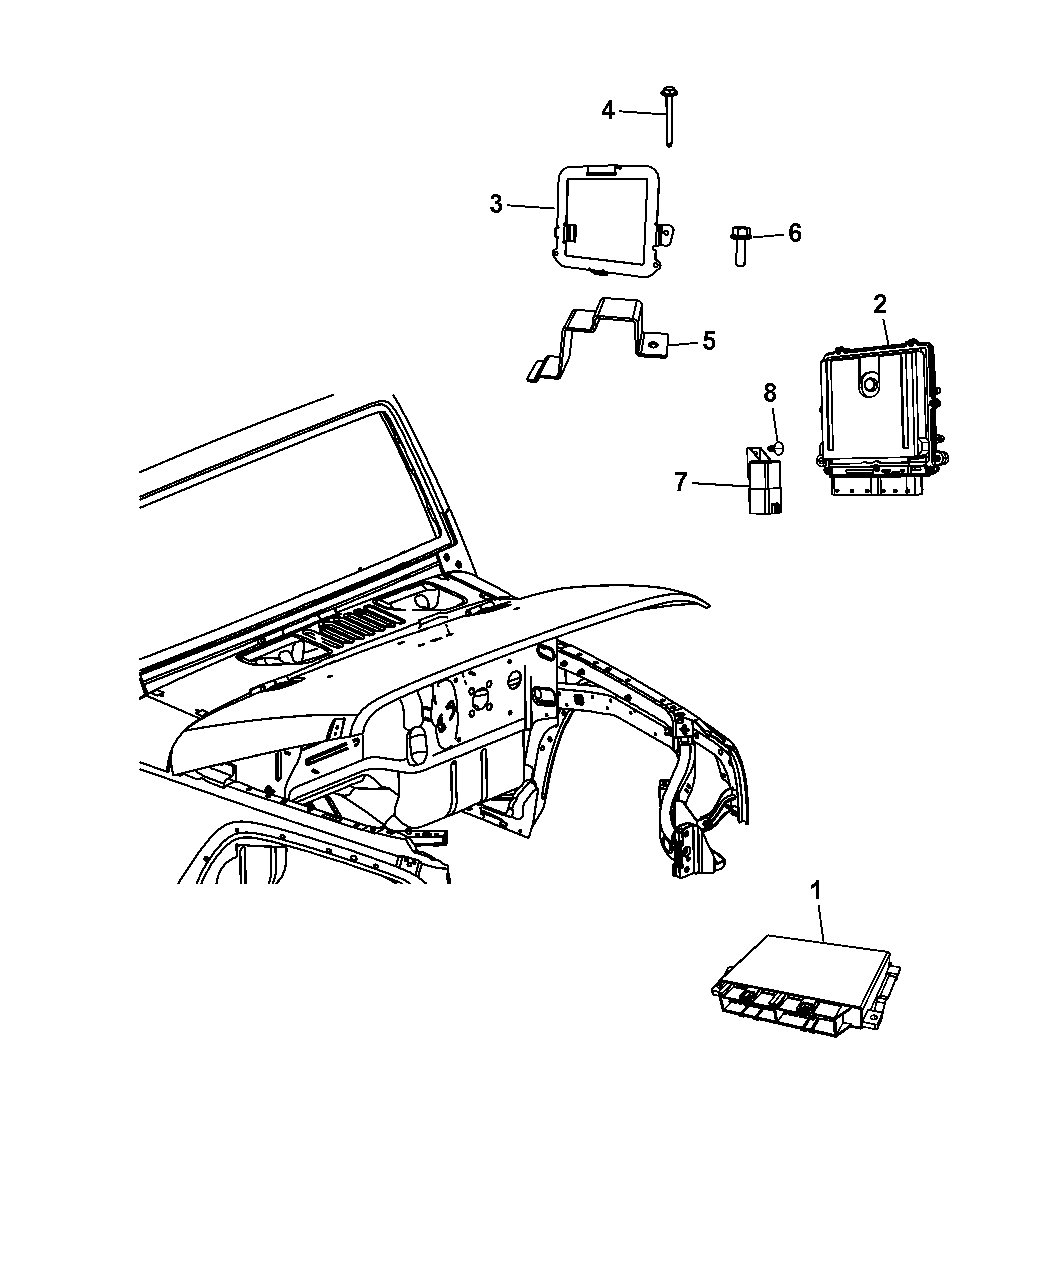 2012 Jeep Wrangler Modules, Engine Compartment